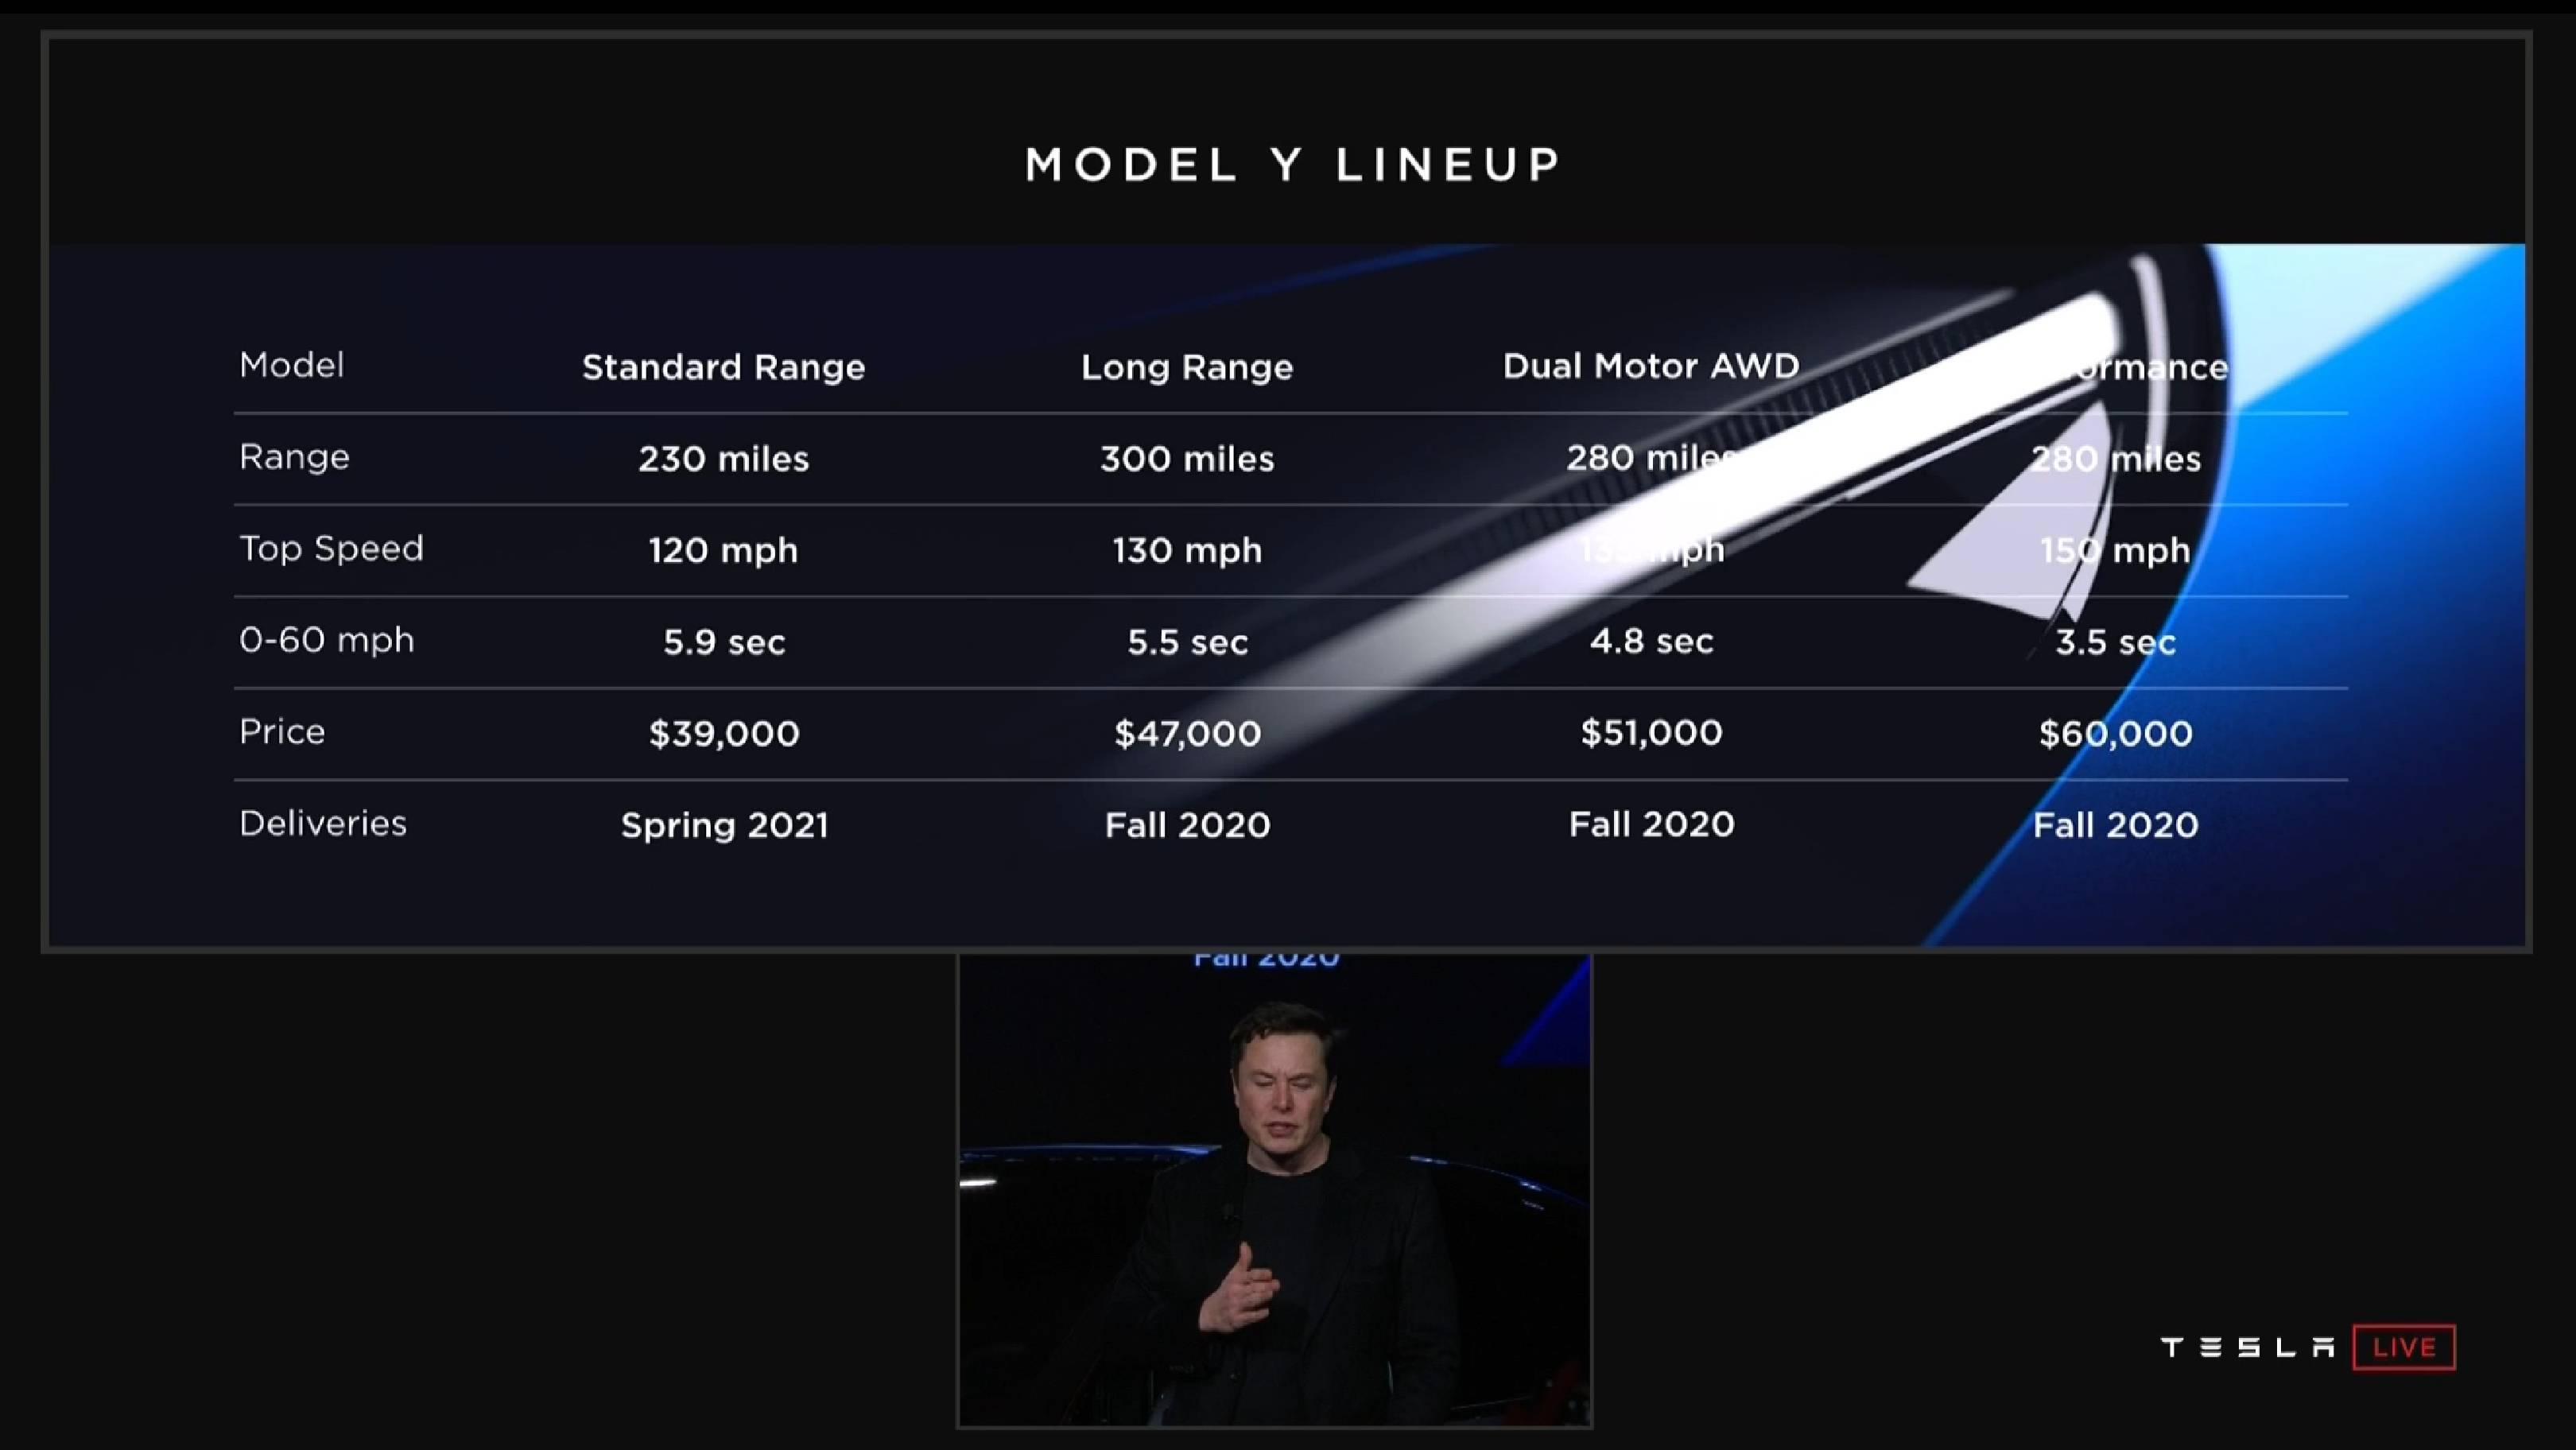 Model Y lineup (Tesla)